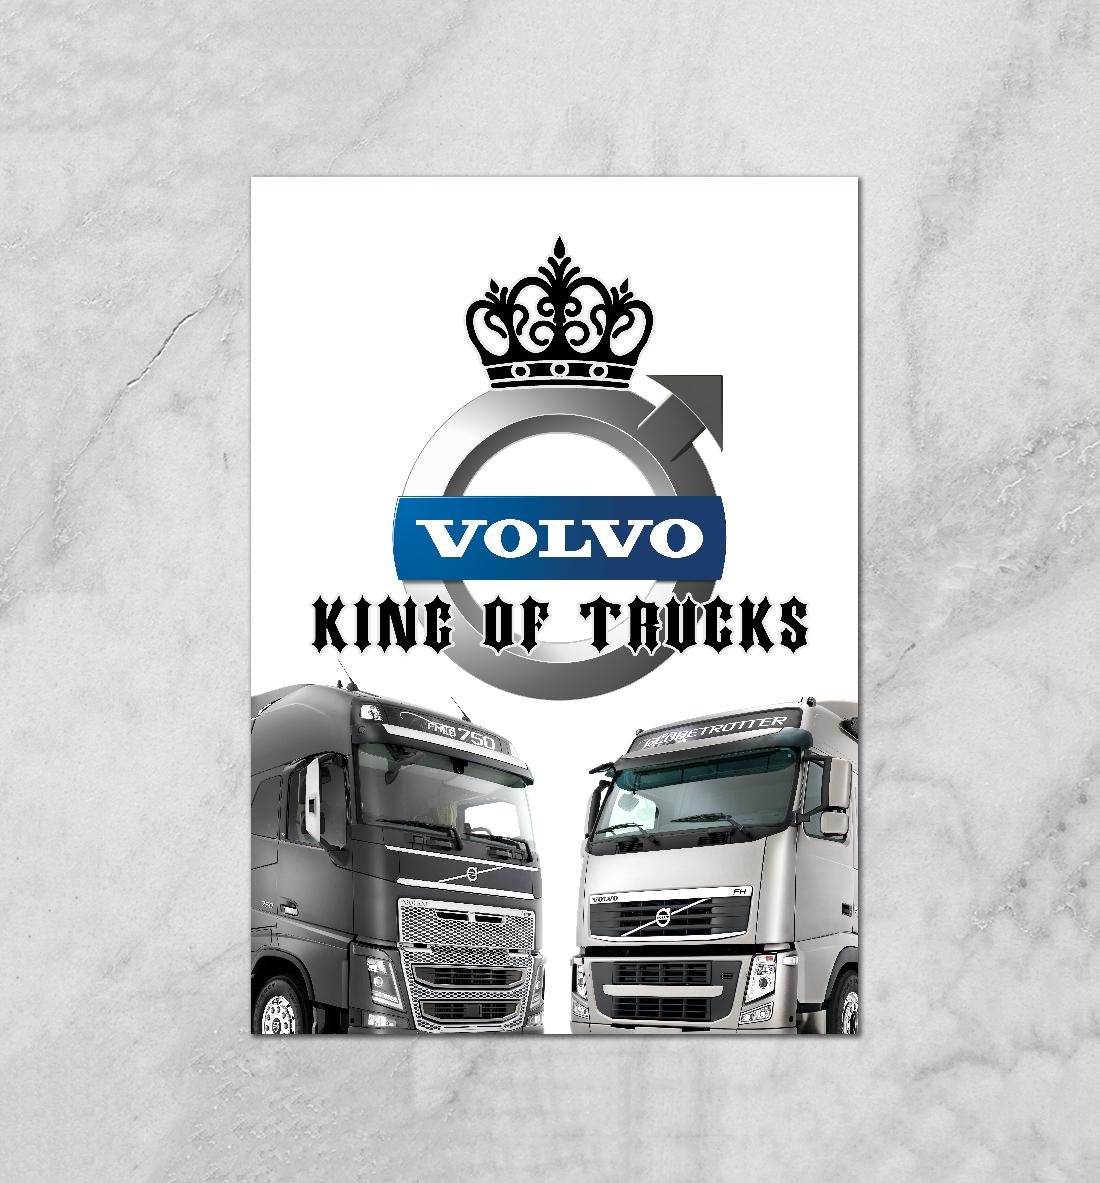 Купить VOLVO - король грузовиков, Printbar, Плакаты, GRZ-894611-plk